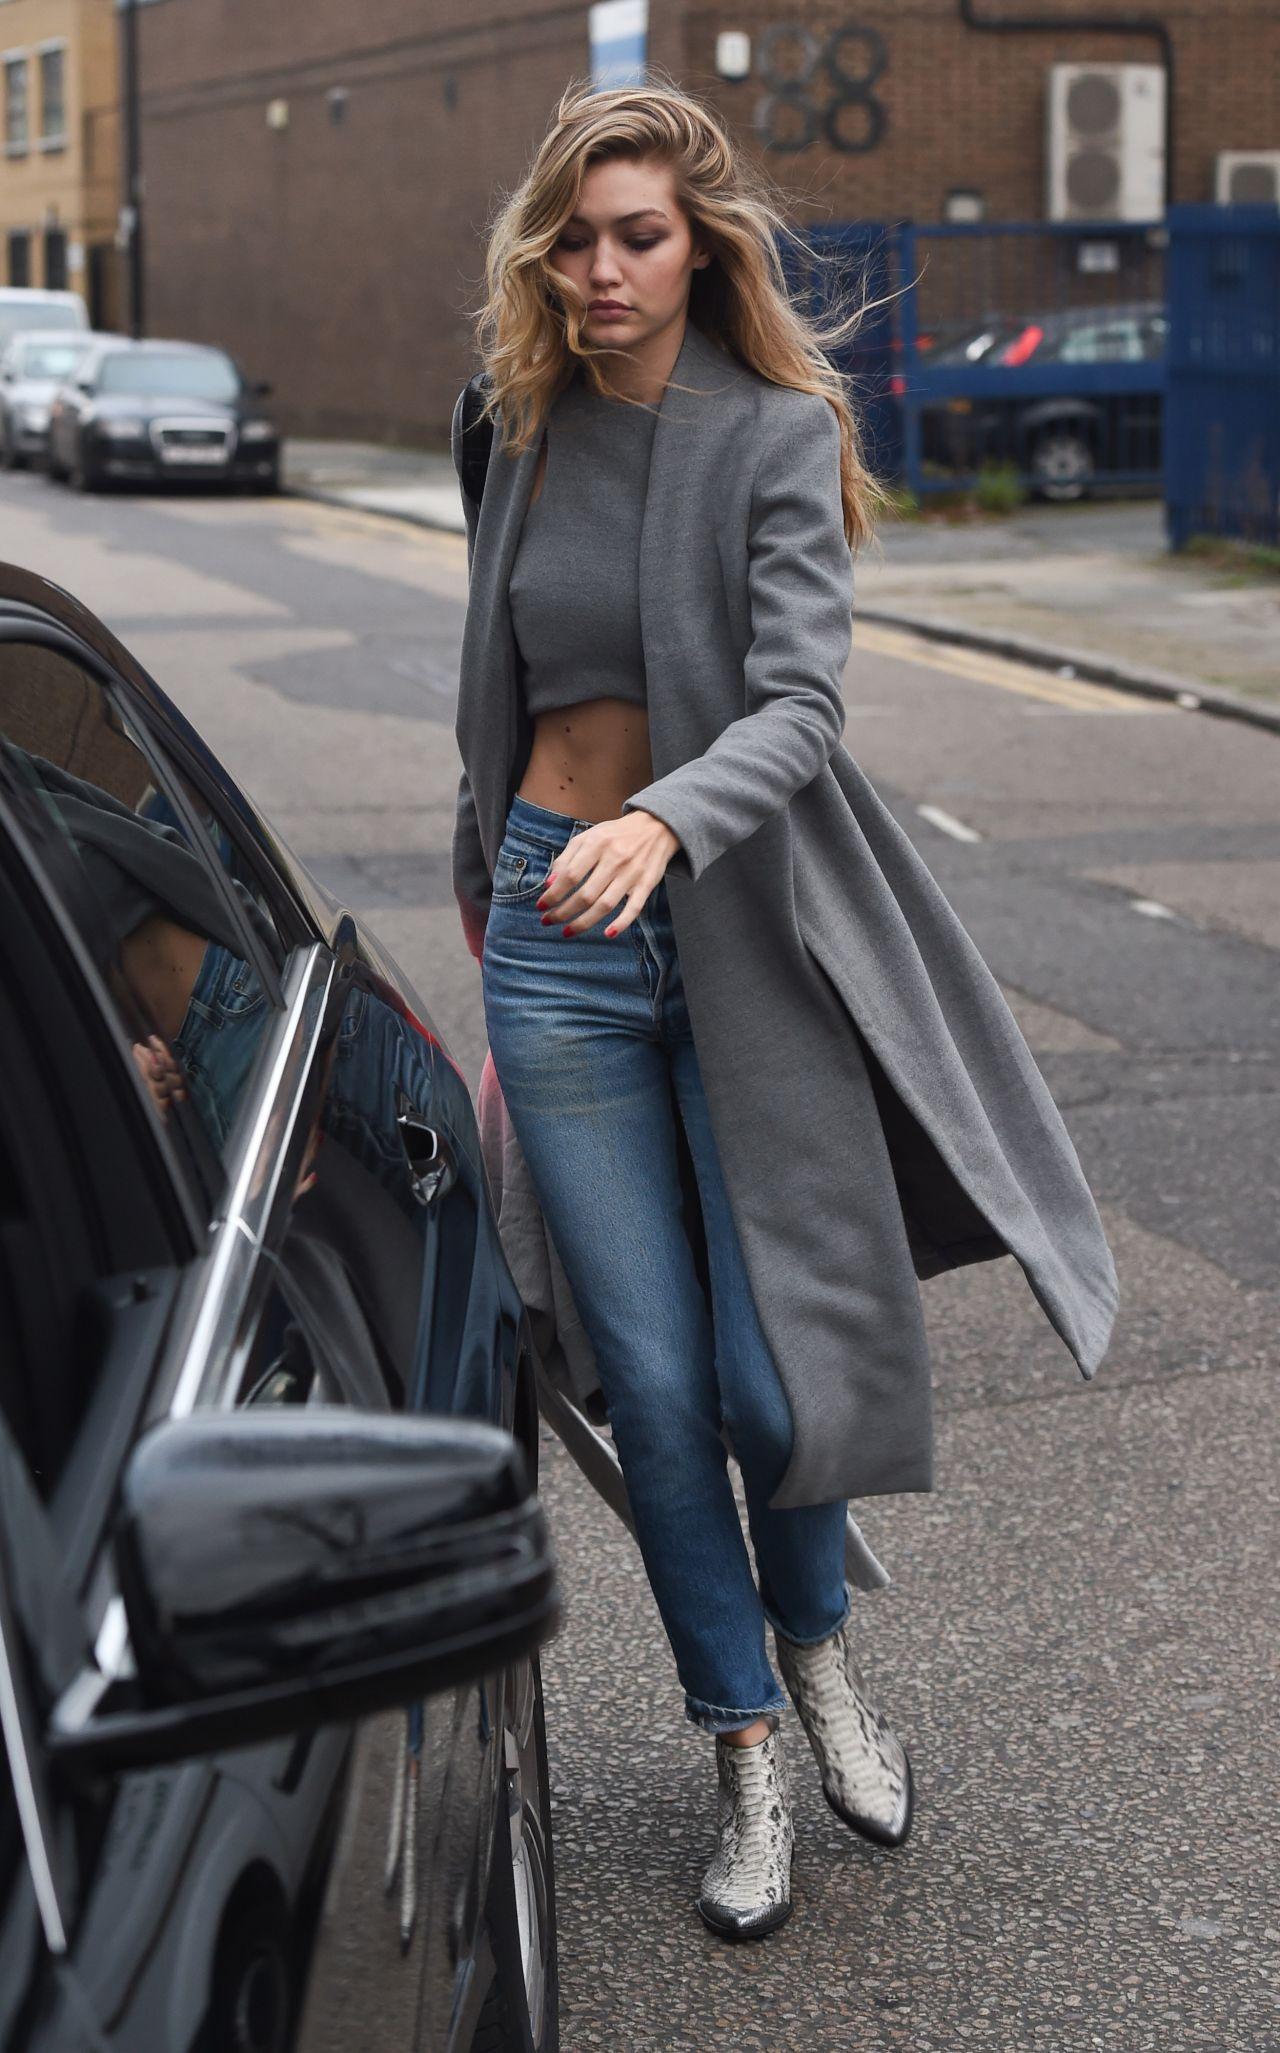 Gigi Hadid Casual Style Leaving Photo Studios In London